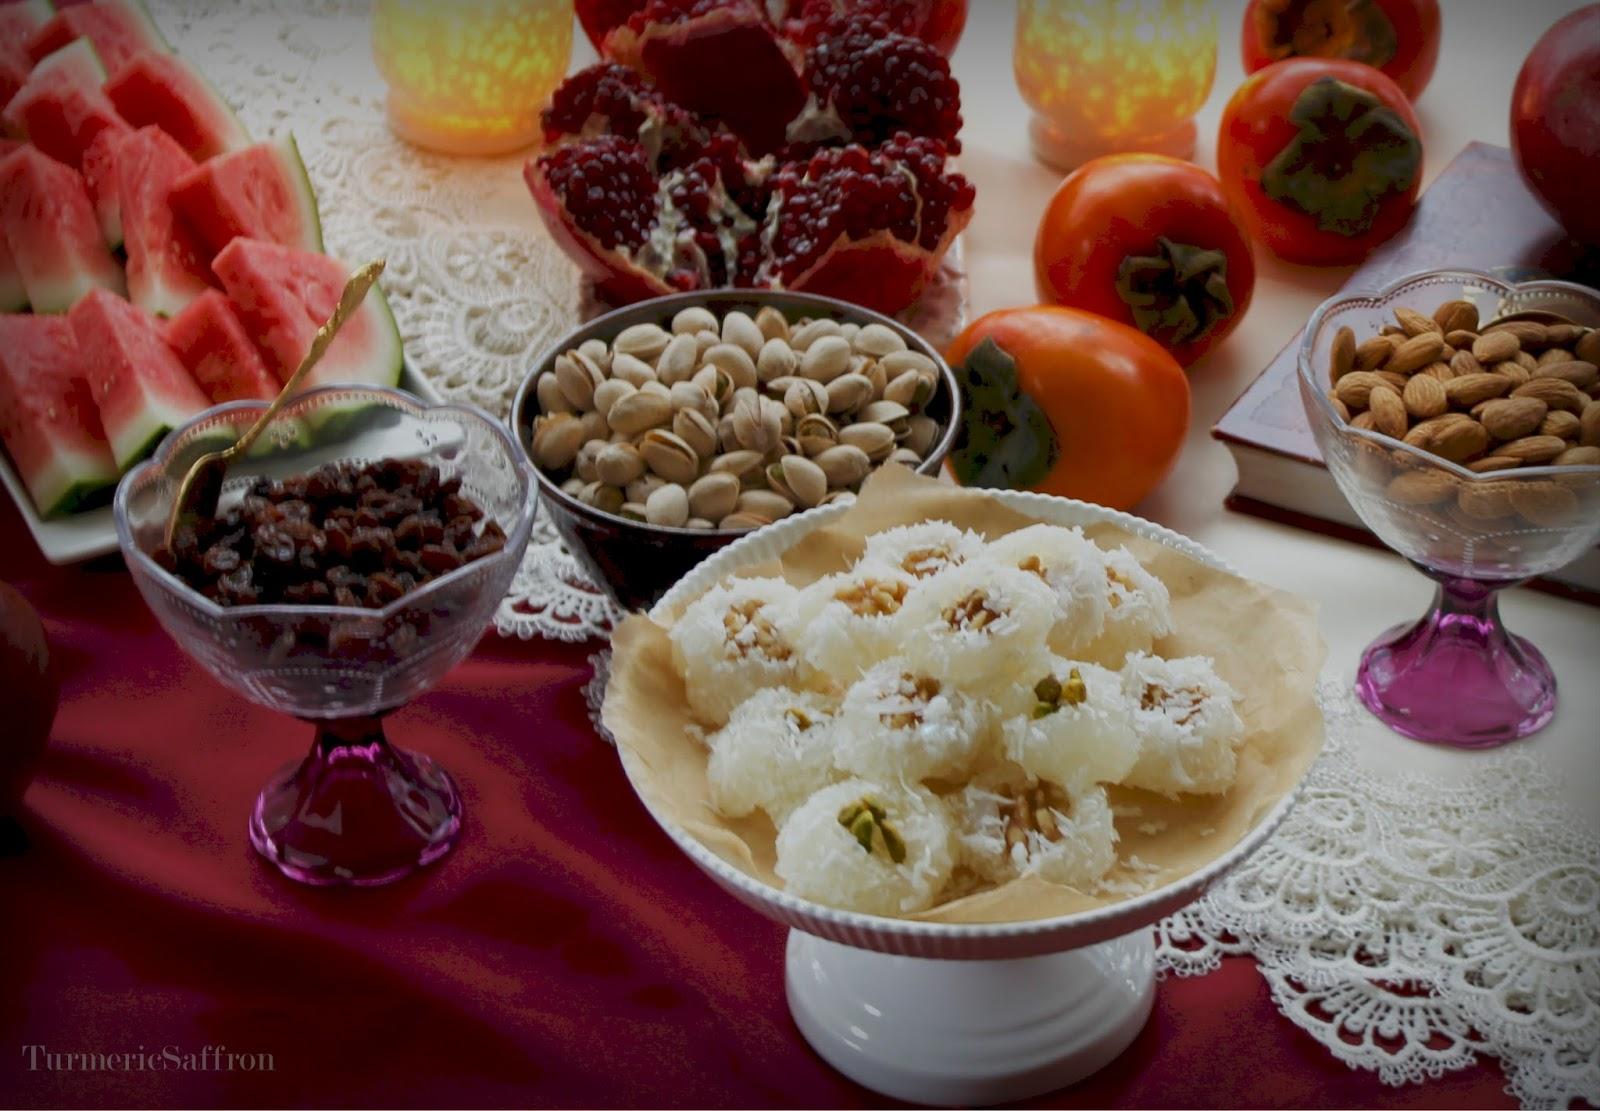 Sugar Bowl Rose Bowl >> Turmeric & Saffron: Shab-e Yalda 2014: Baslogh Recipe to Celebrate the Persian Yalda Night